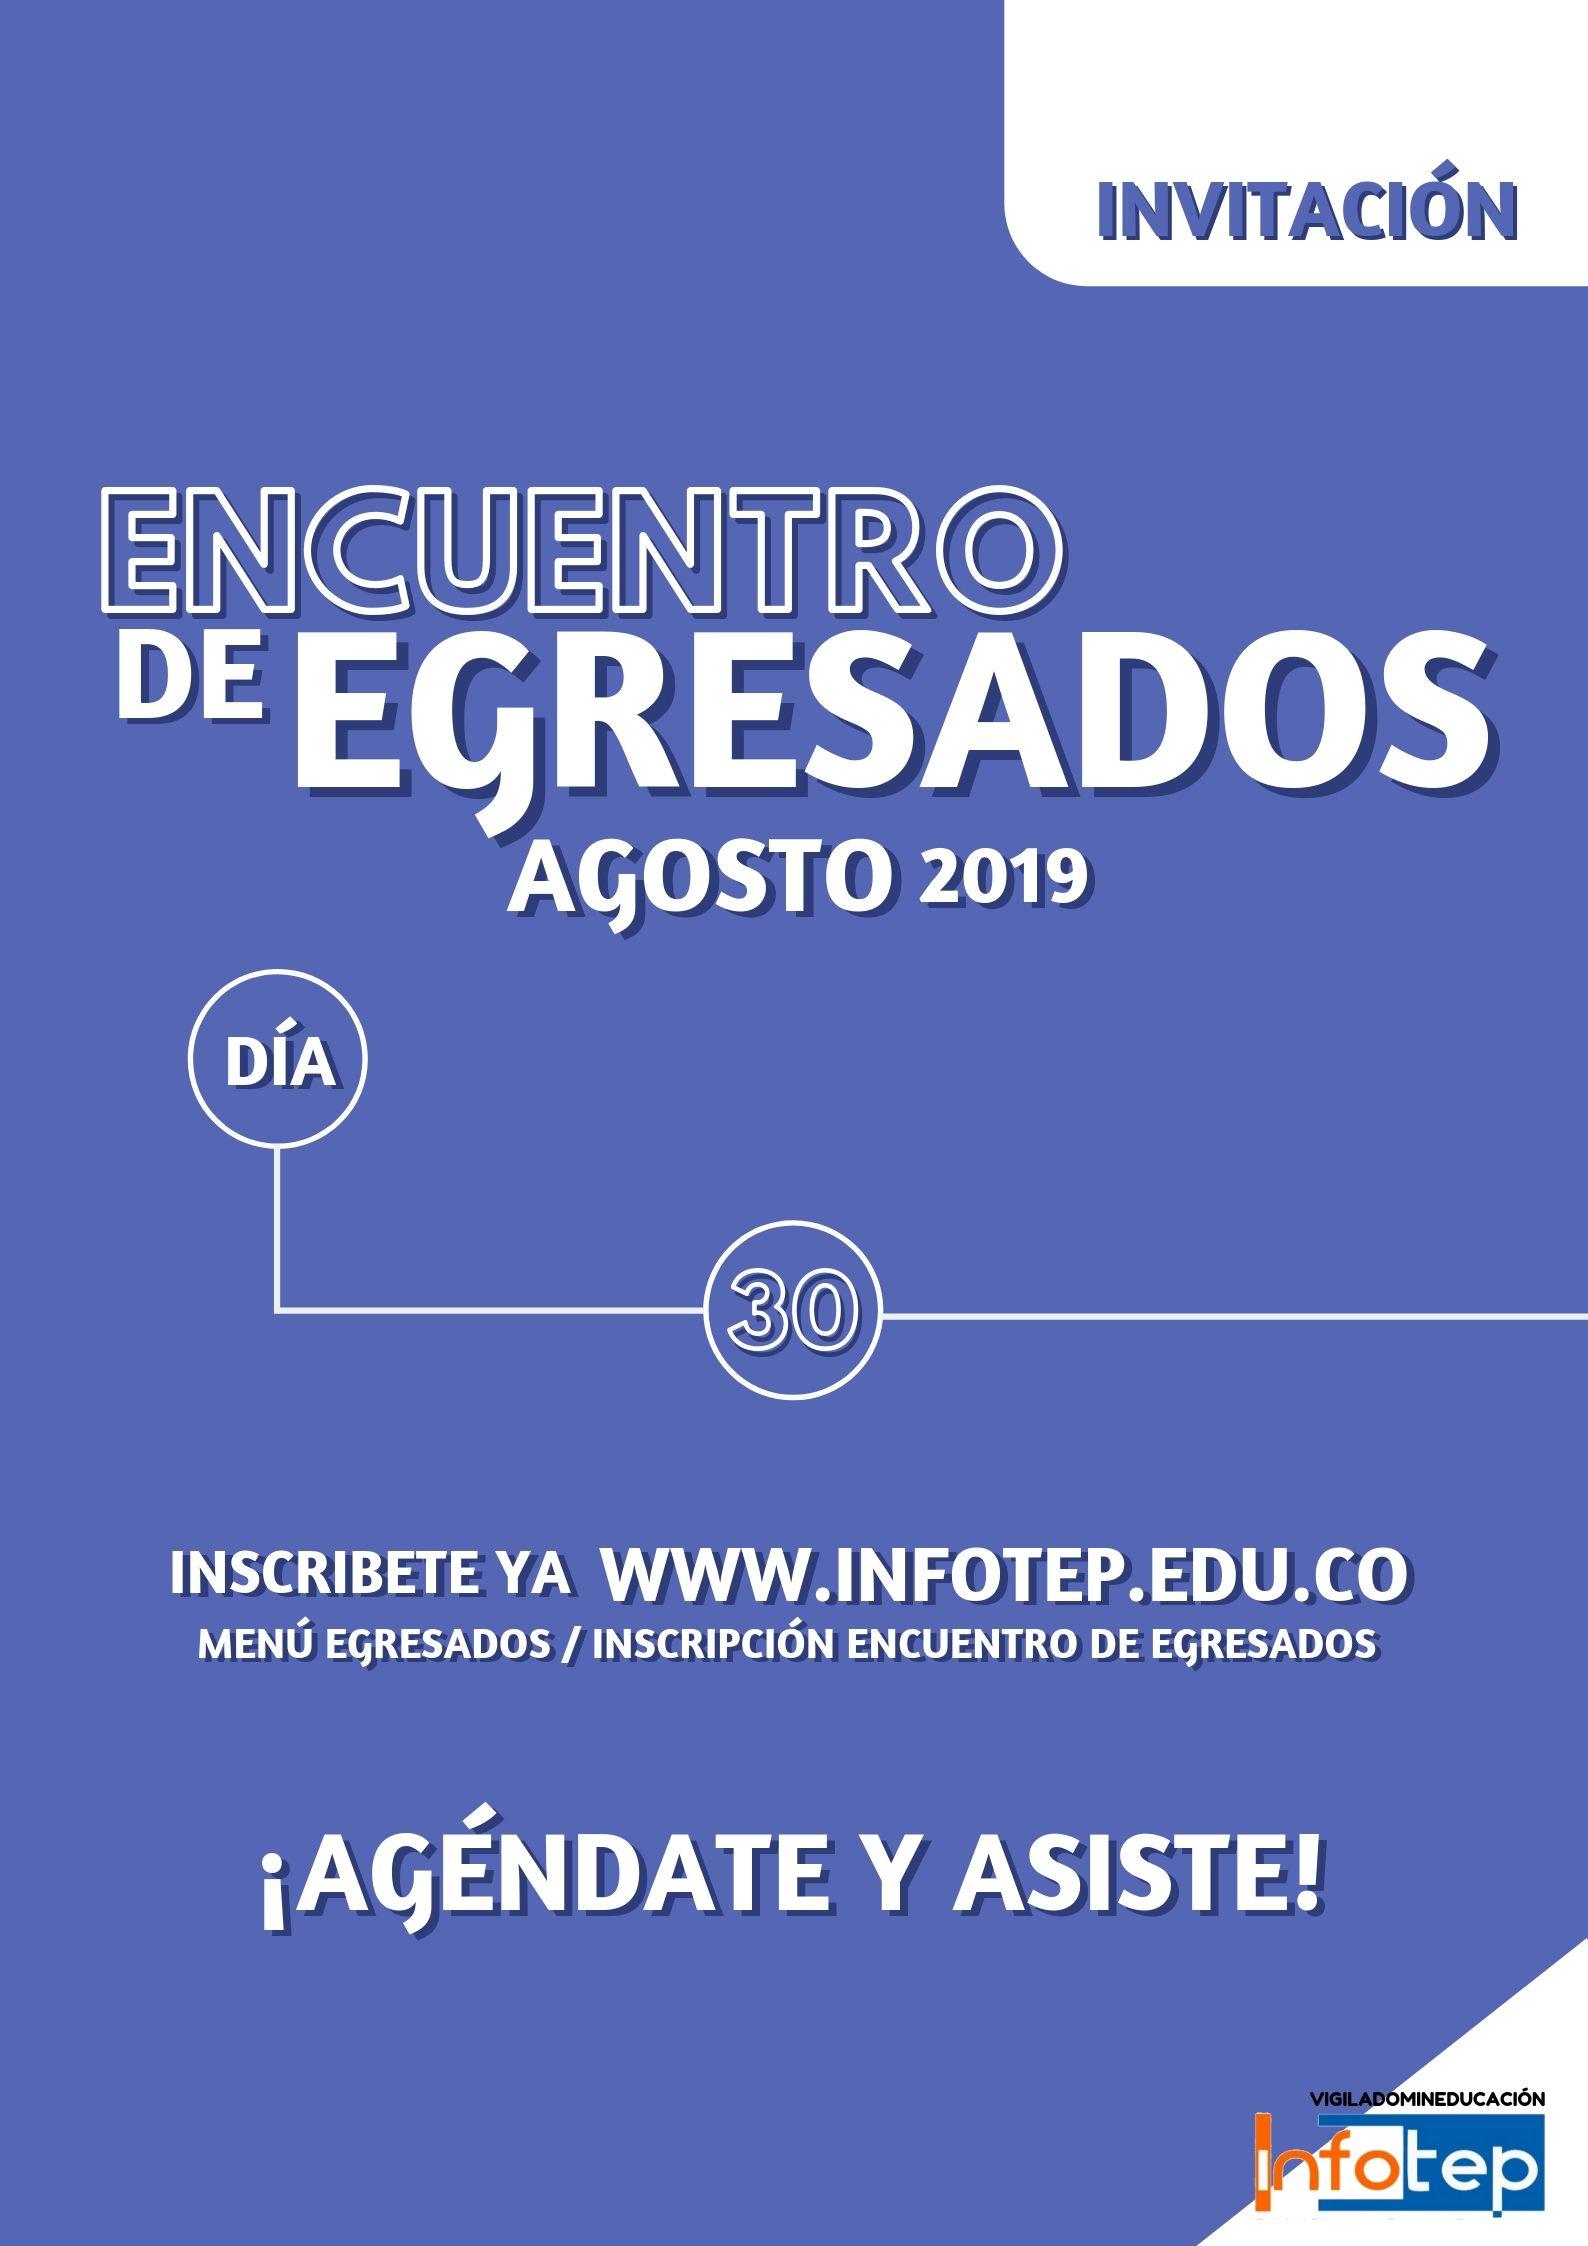 Calendario Academico Us.Calendario Academico